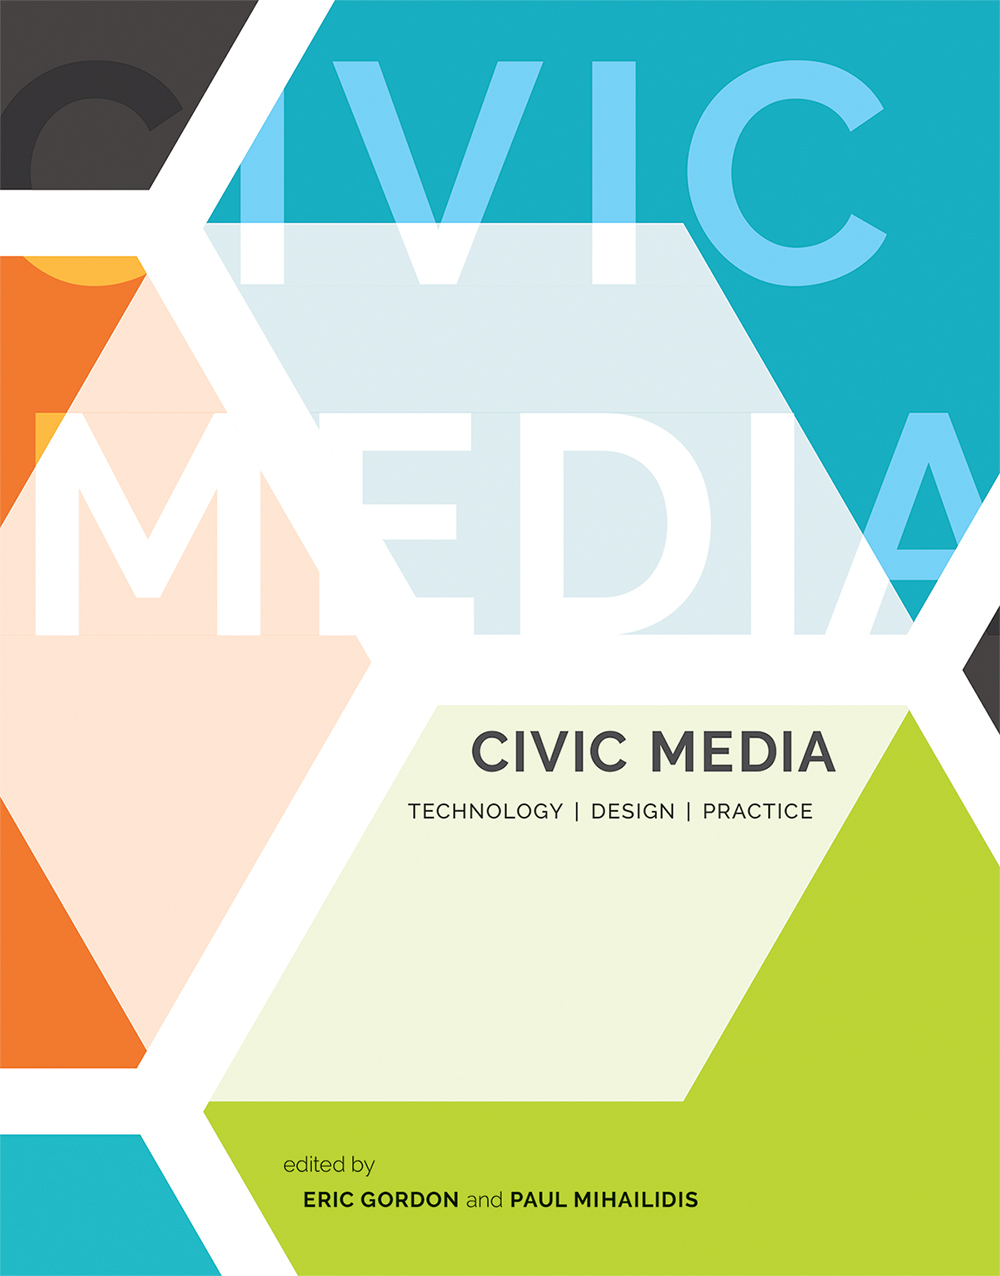 Civic Media: Technology, Design, Practice (MIT Press, 2016)